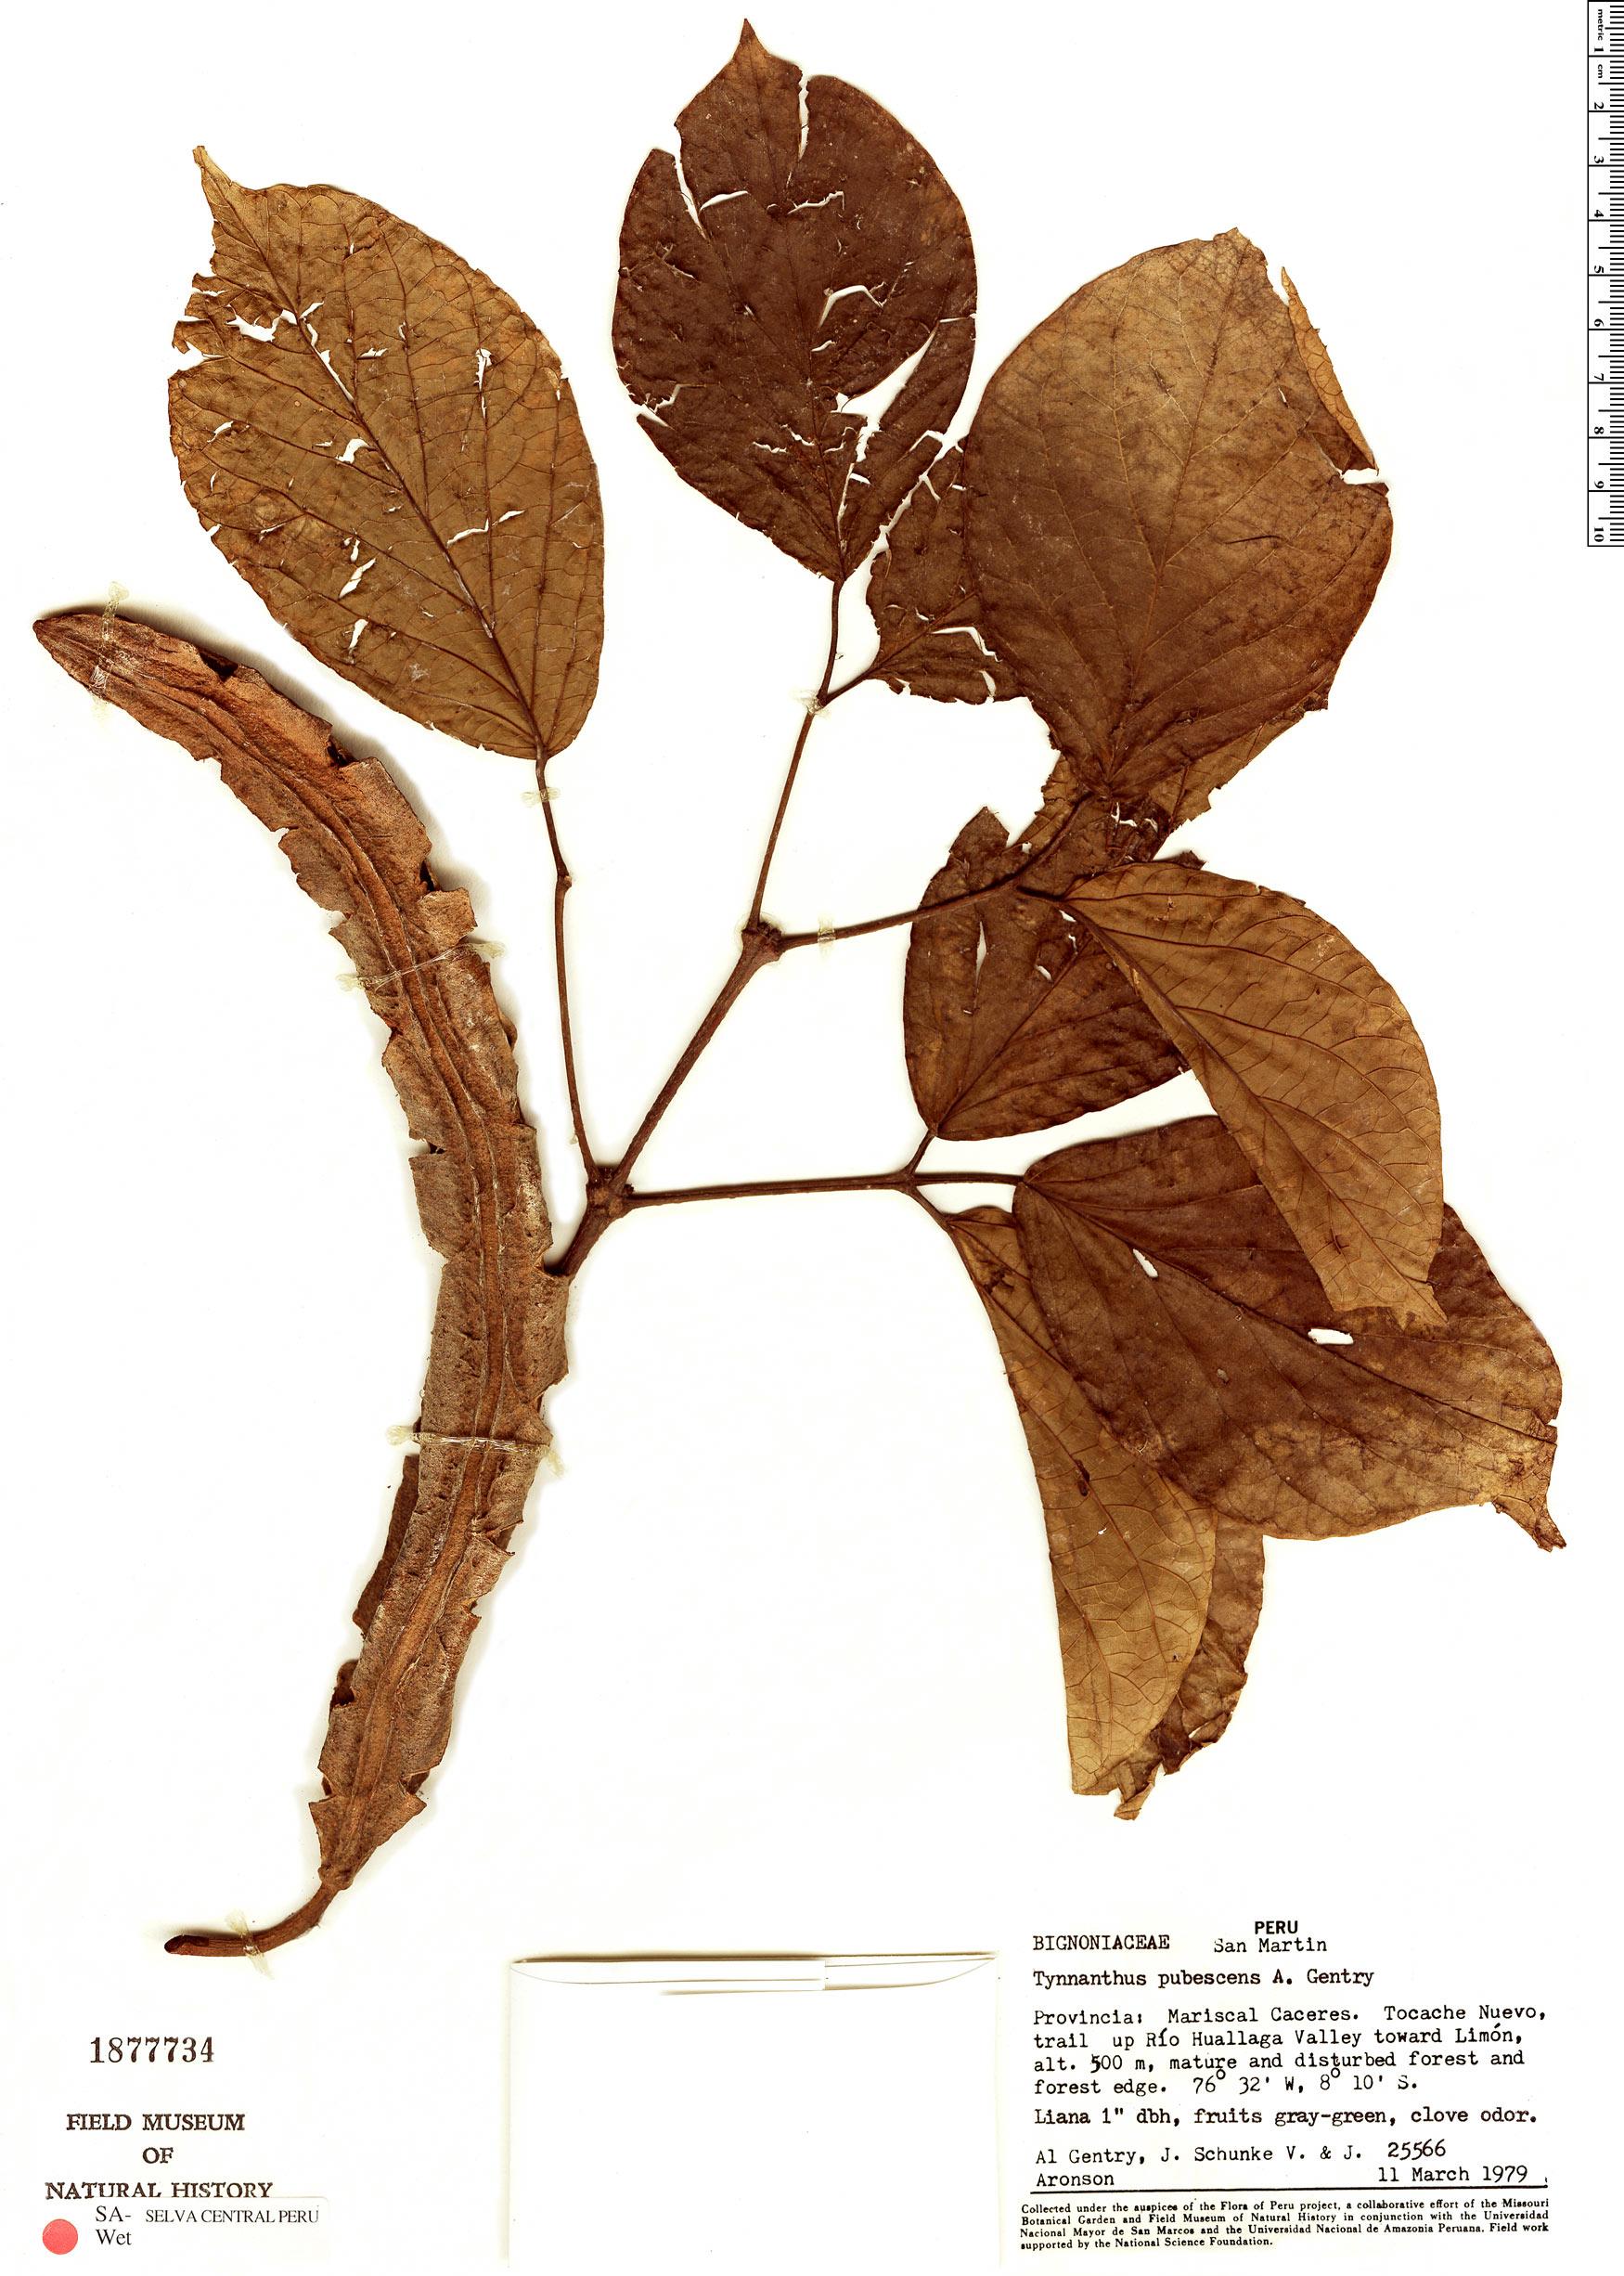 Specimen: Tynanthus pubescens